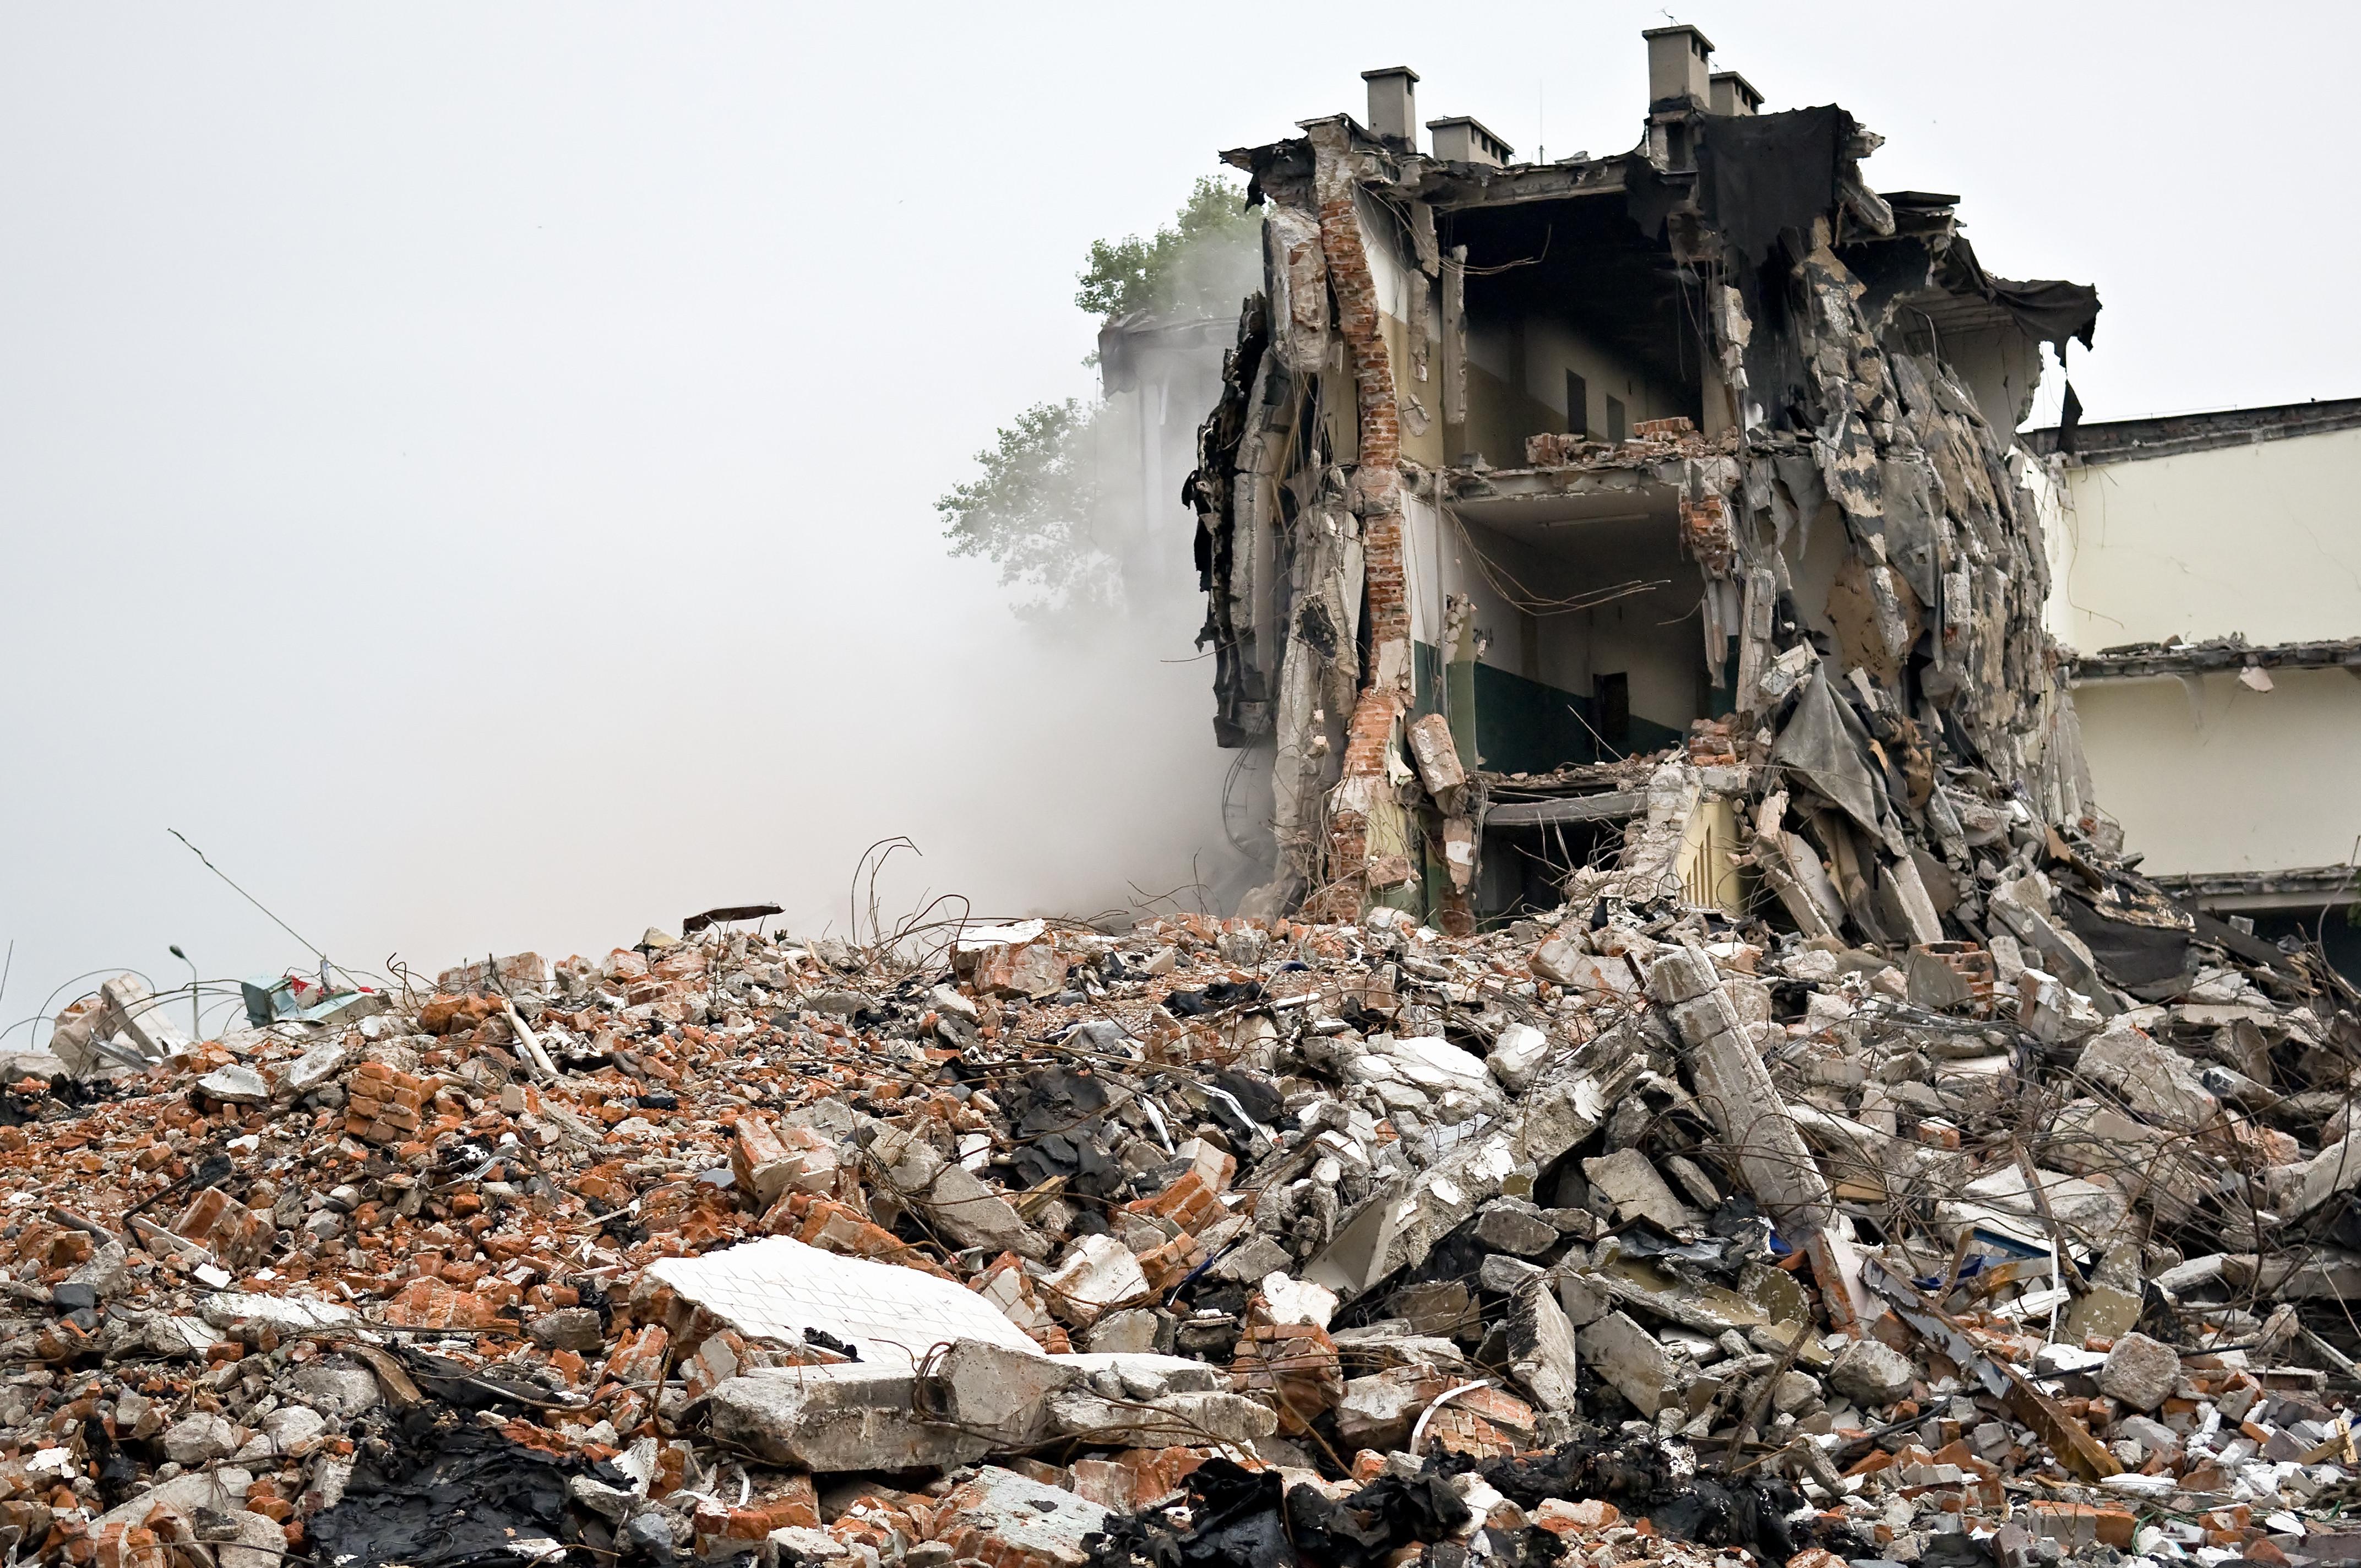 Una casa completamente destrozada / Wikimedia